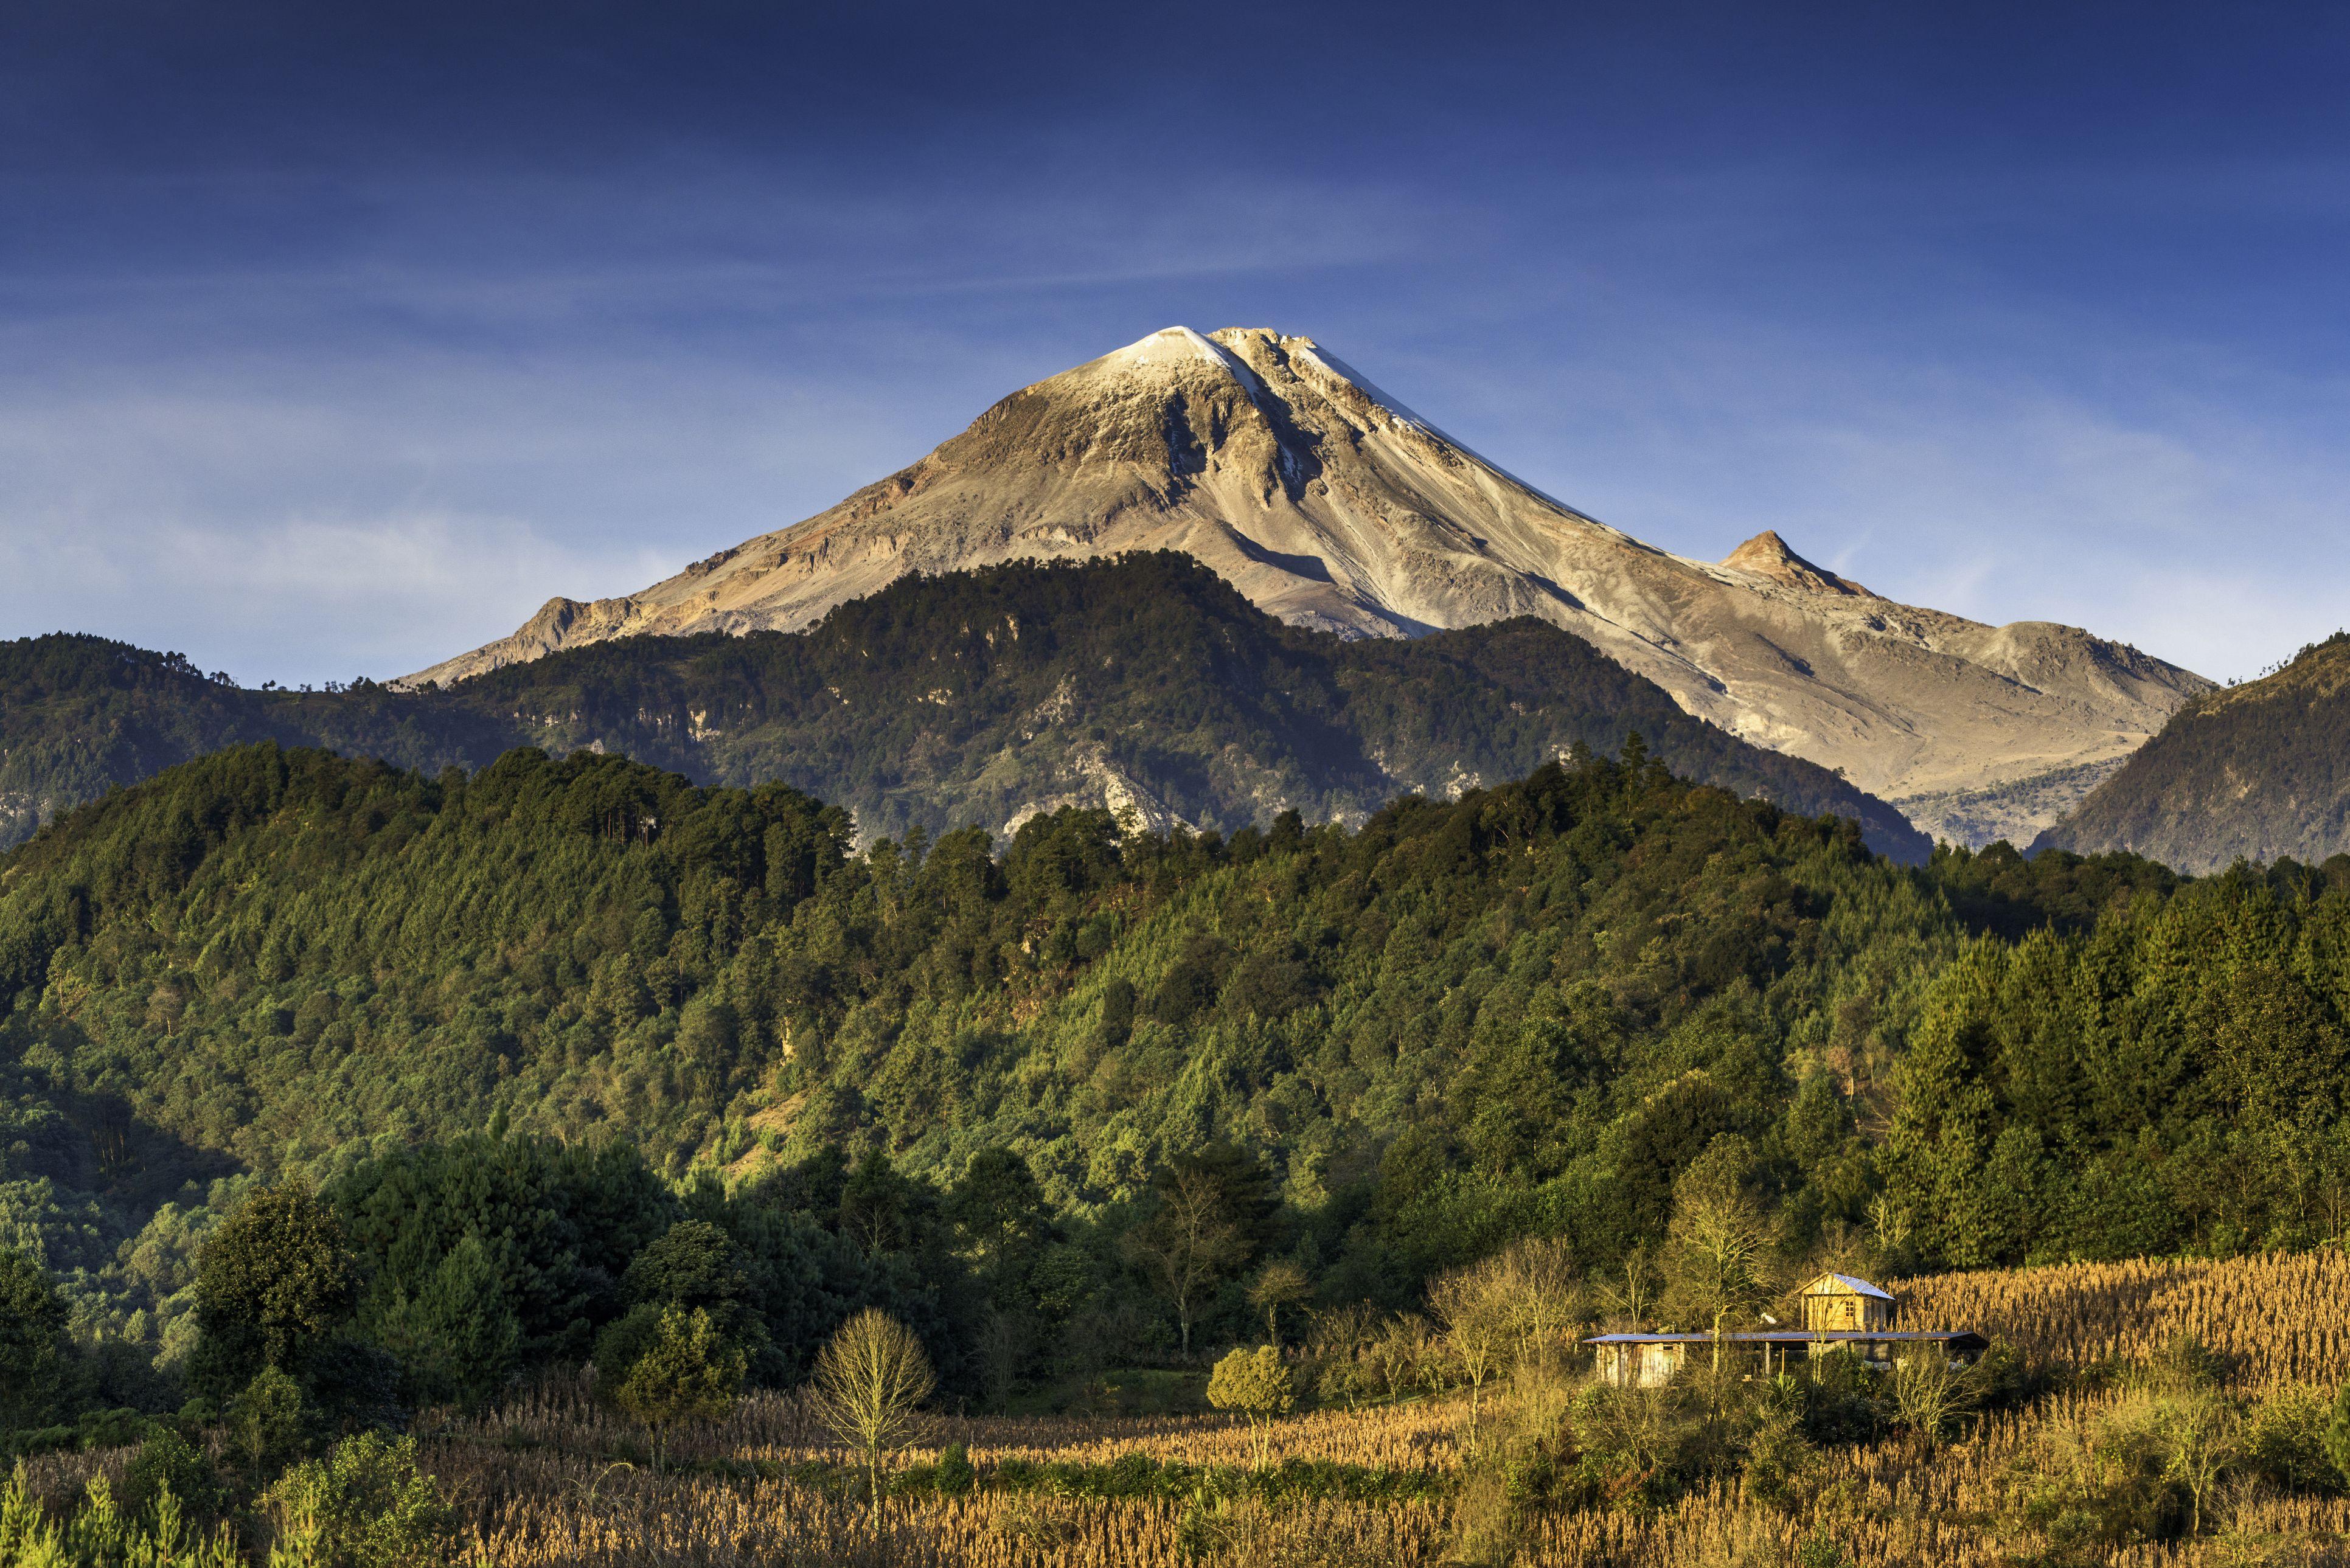 Pico de Orizaba, near Coscomatepec, Mexico